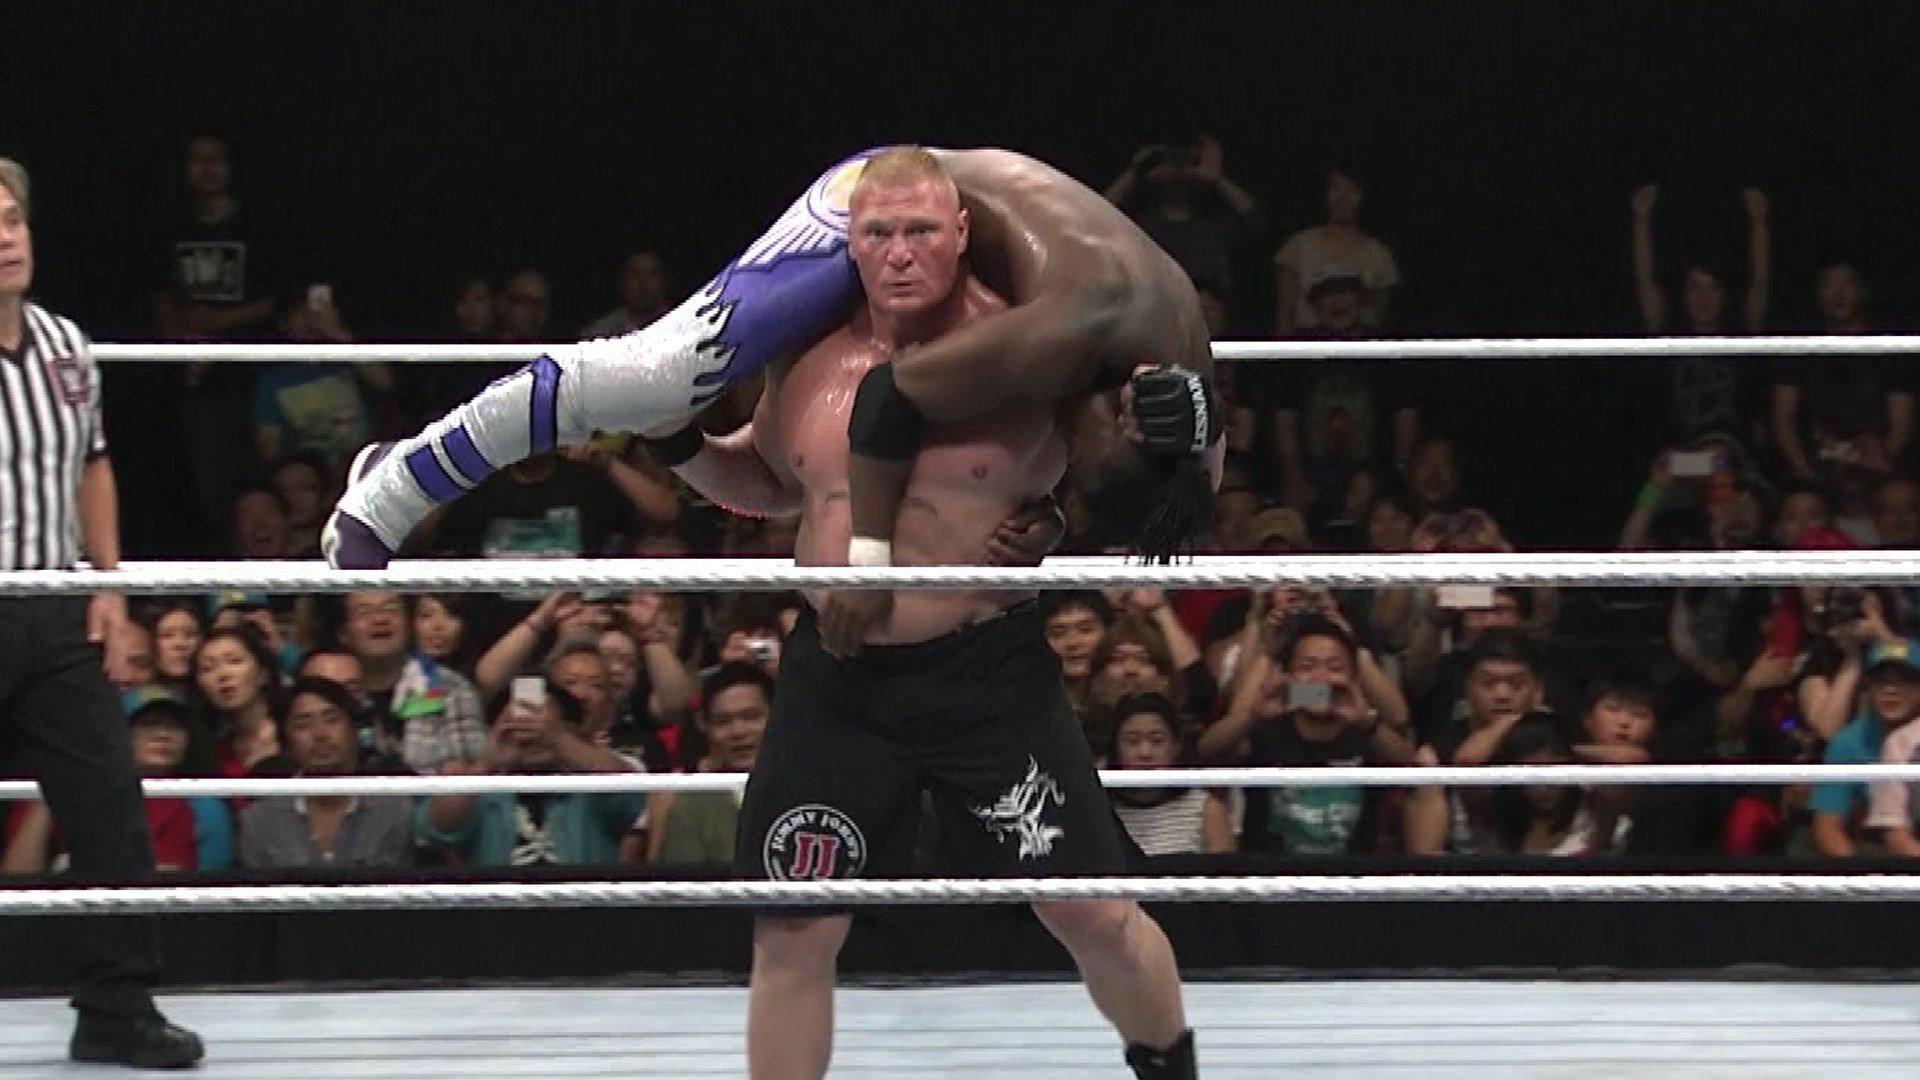 The last few moment of Kofi Kingston's conscious life - WWE.com